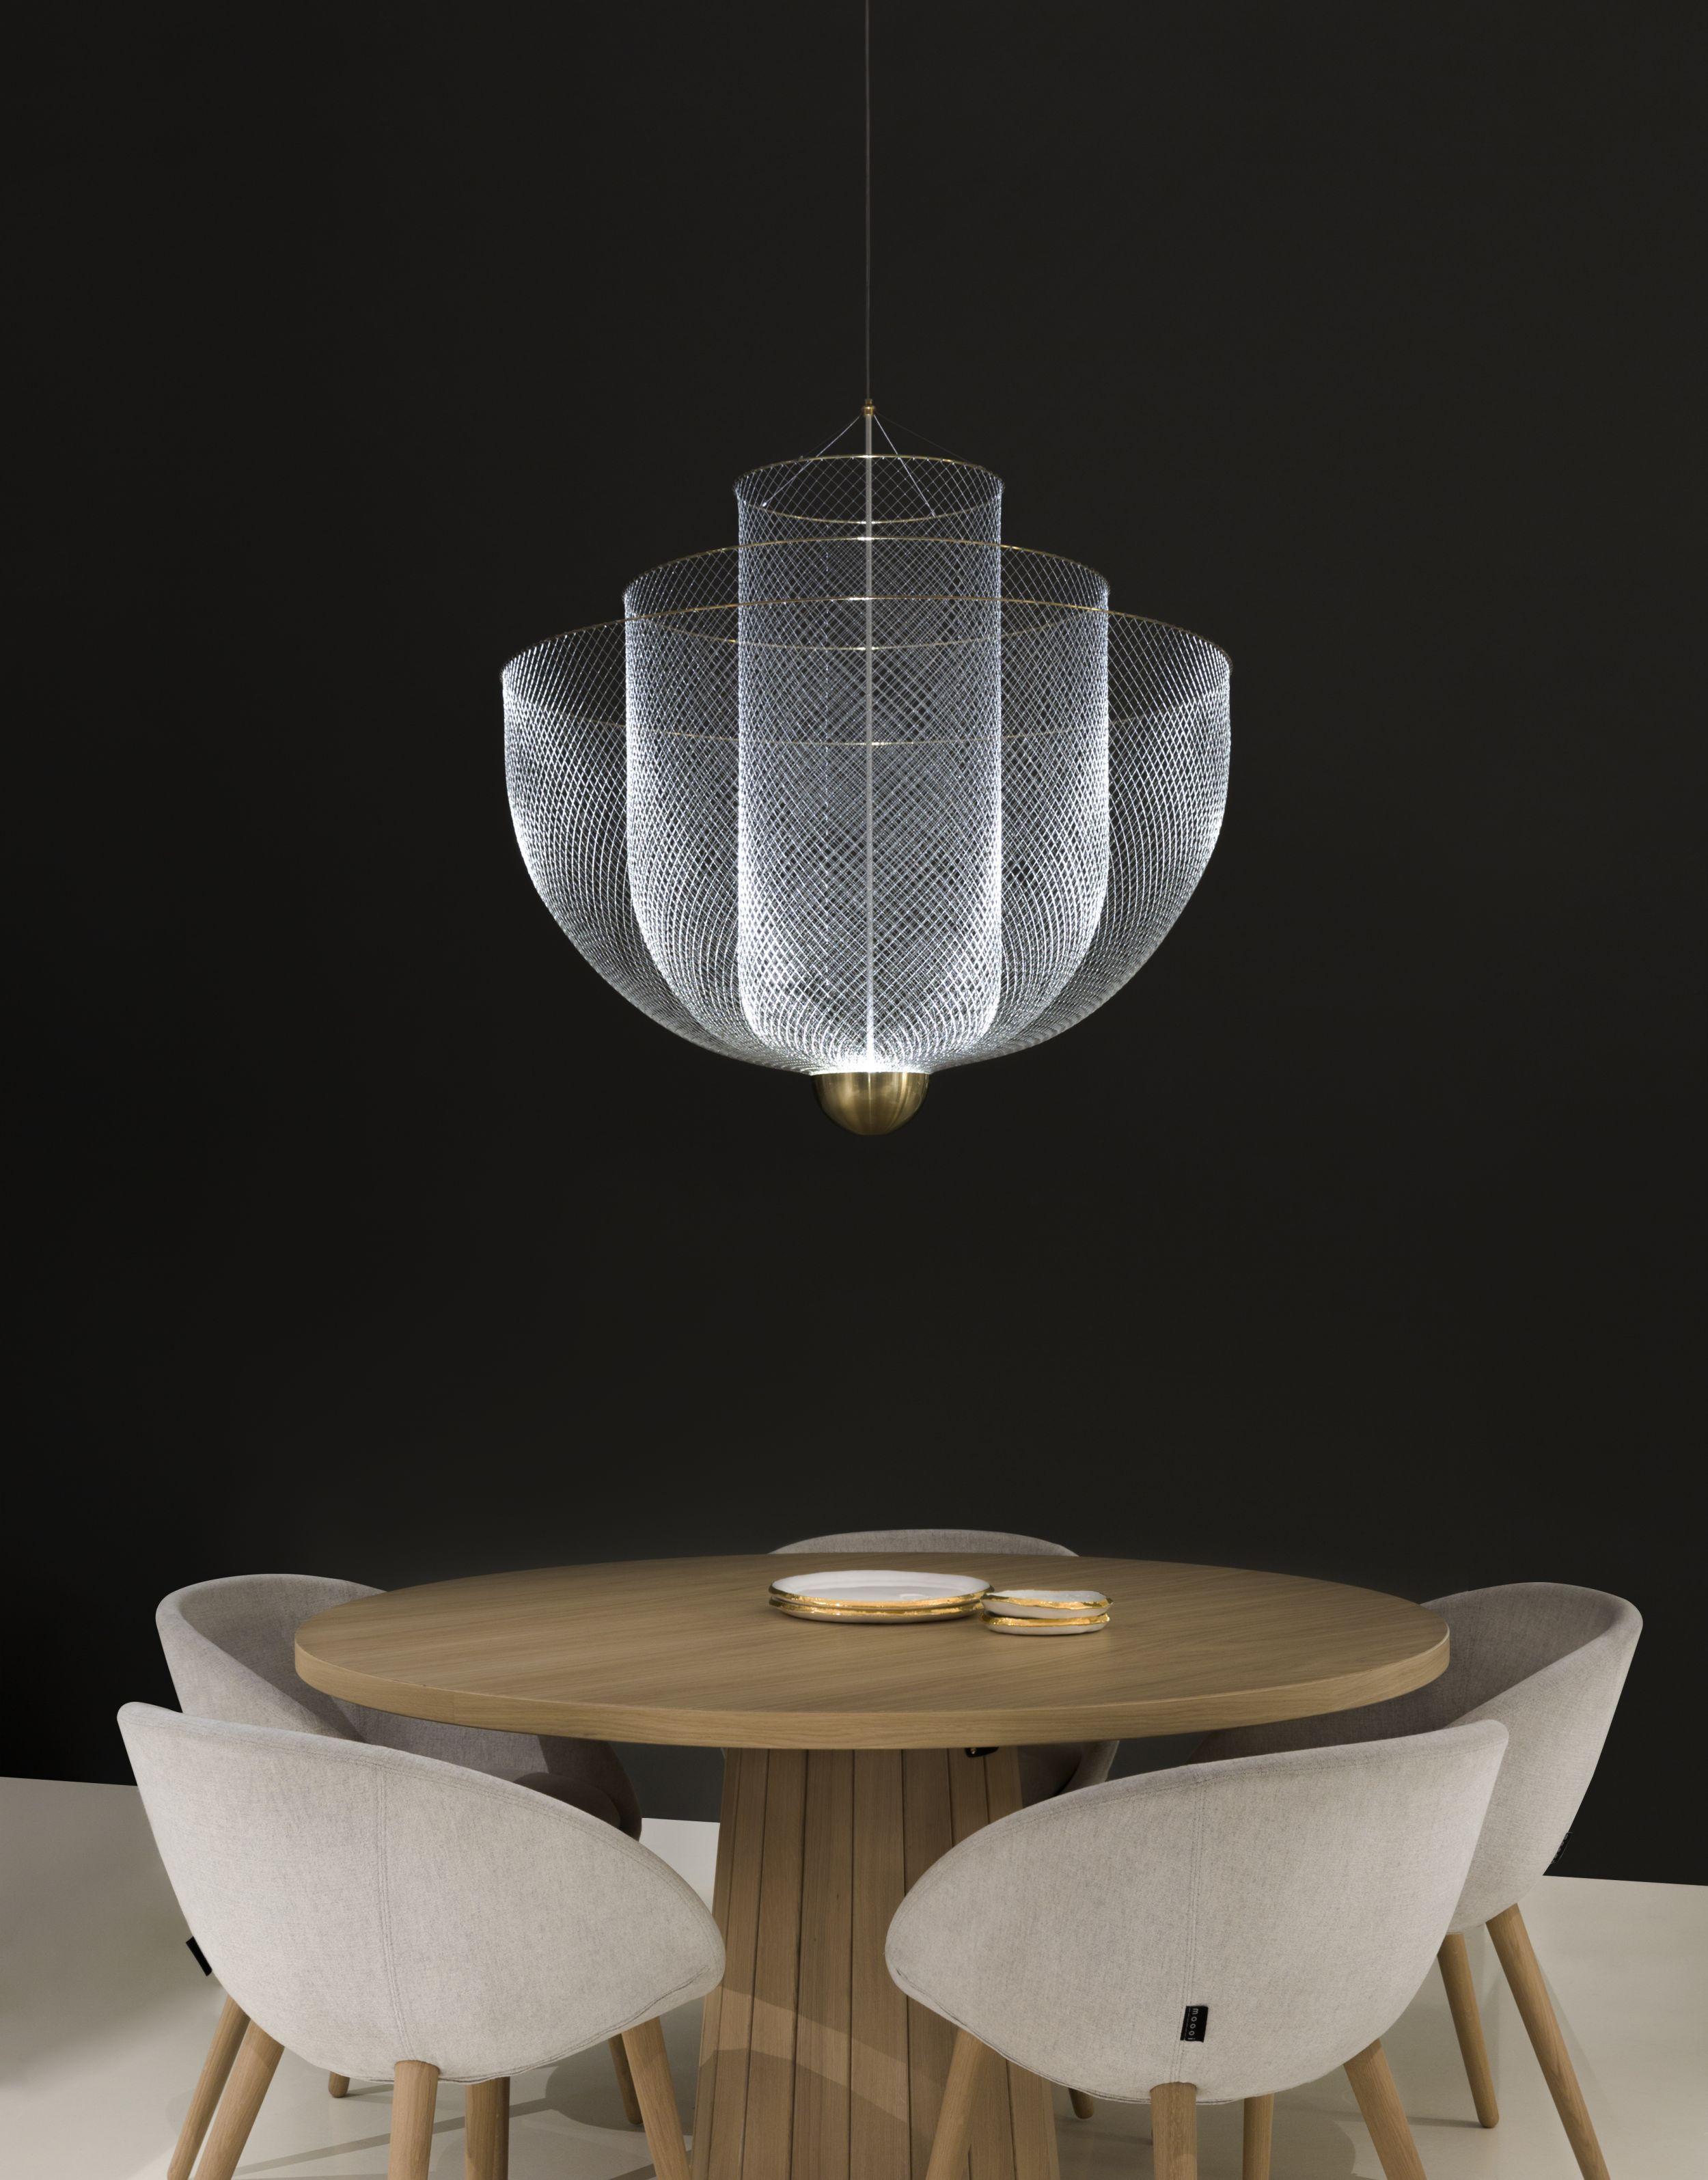 Meshmatics Interior Lighting Bedroom Ceiling Light Chandelier